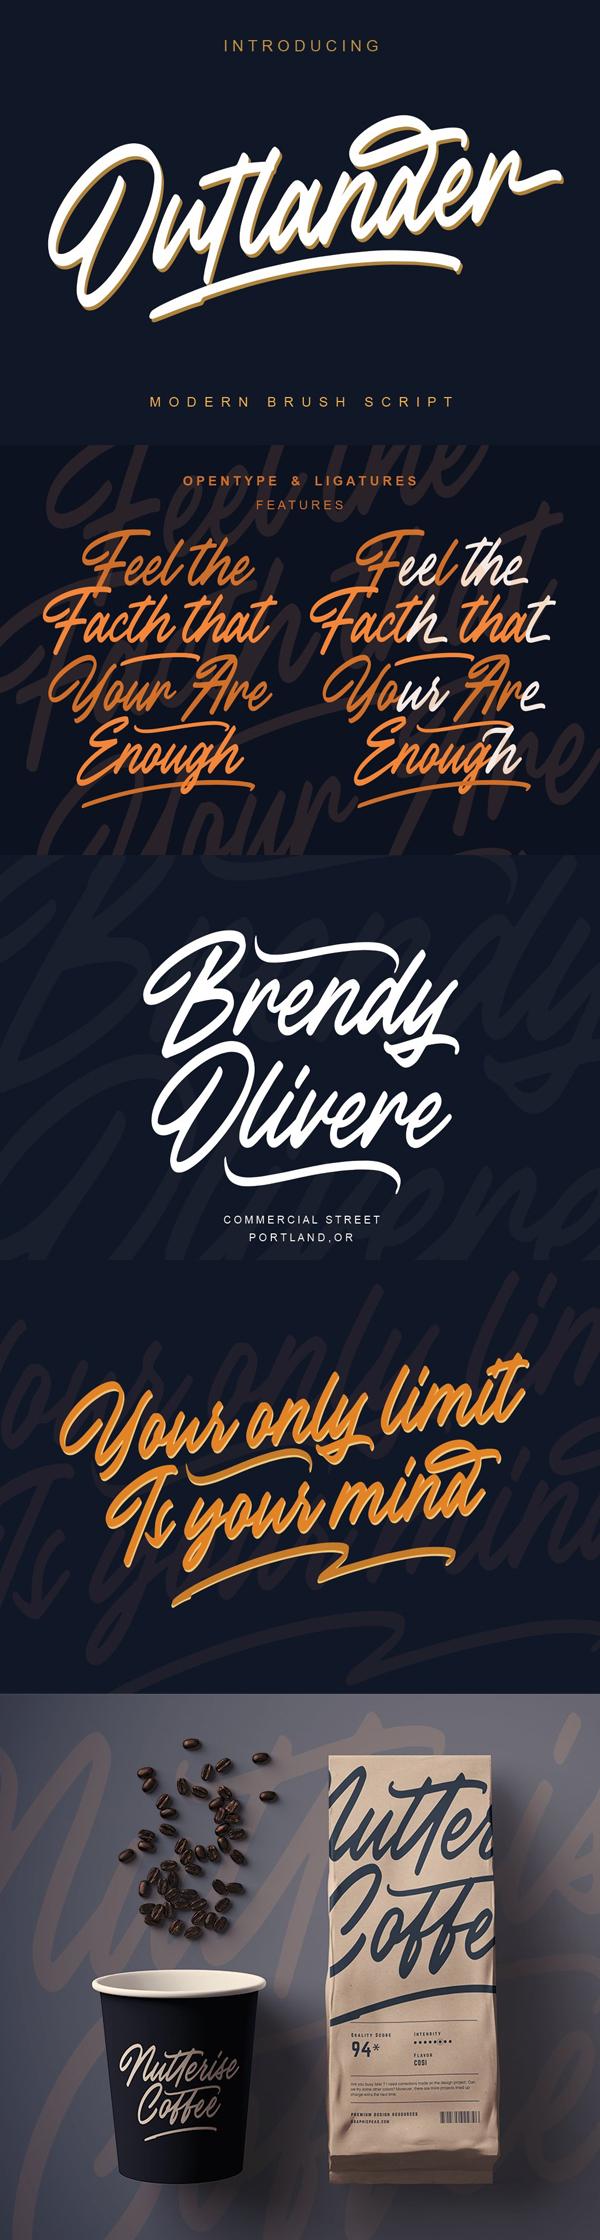 Outlander Brush Script Free font